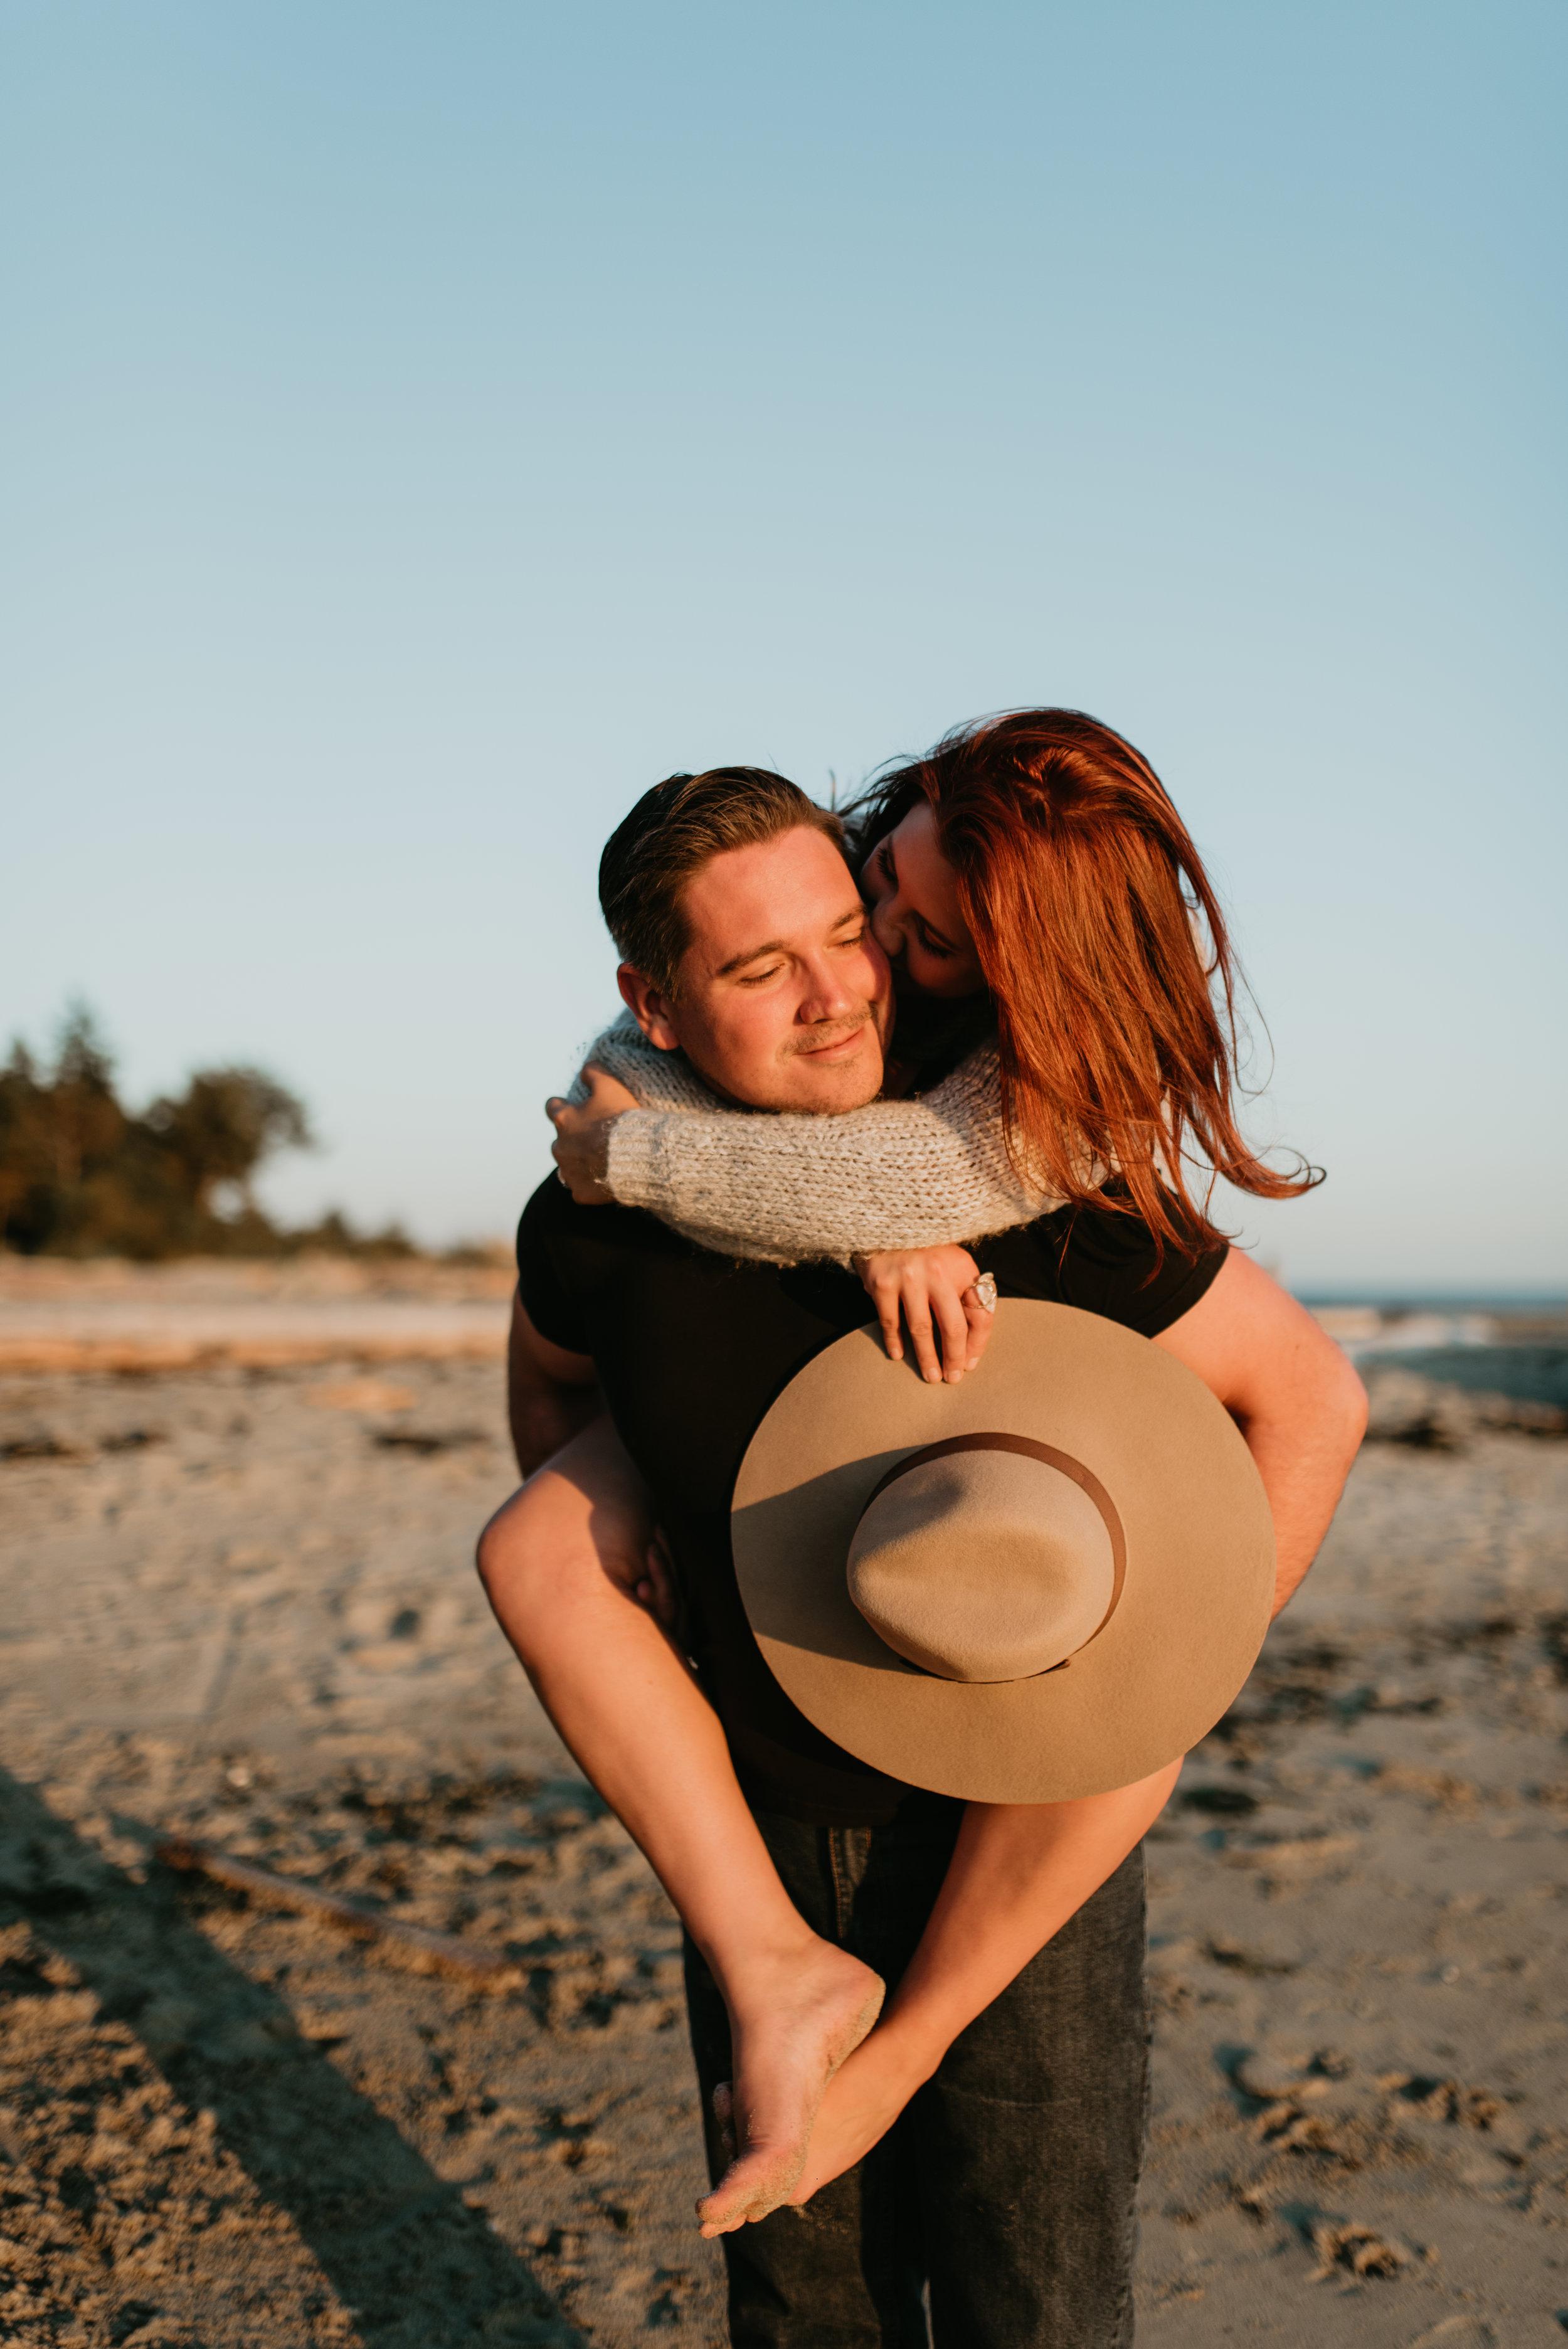 Kaylyn&SeanSeptember13,2017-LauraOlsonPhotography-SunshineCoastBCPhotographer-0600.jpg